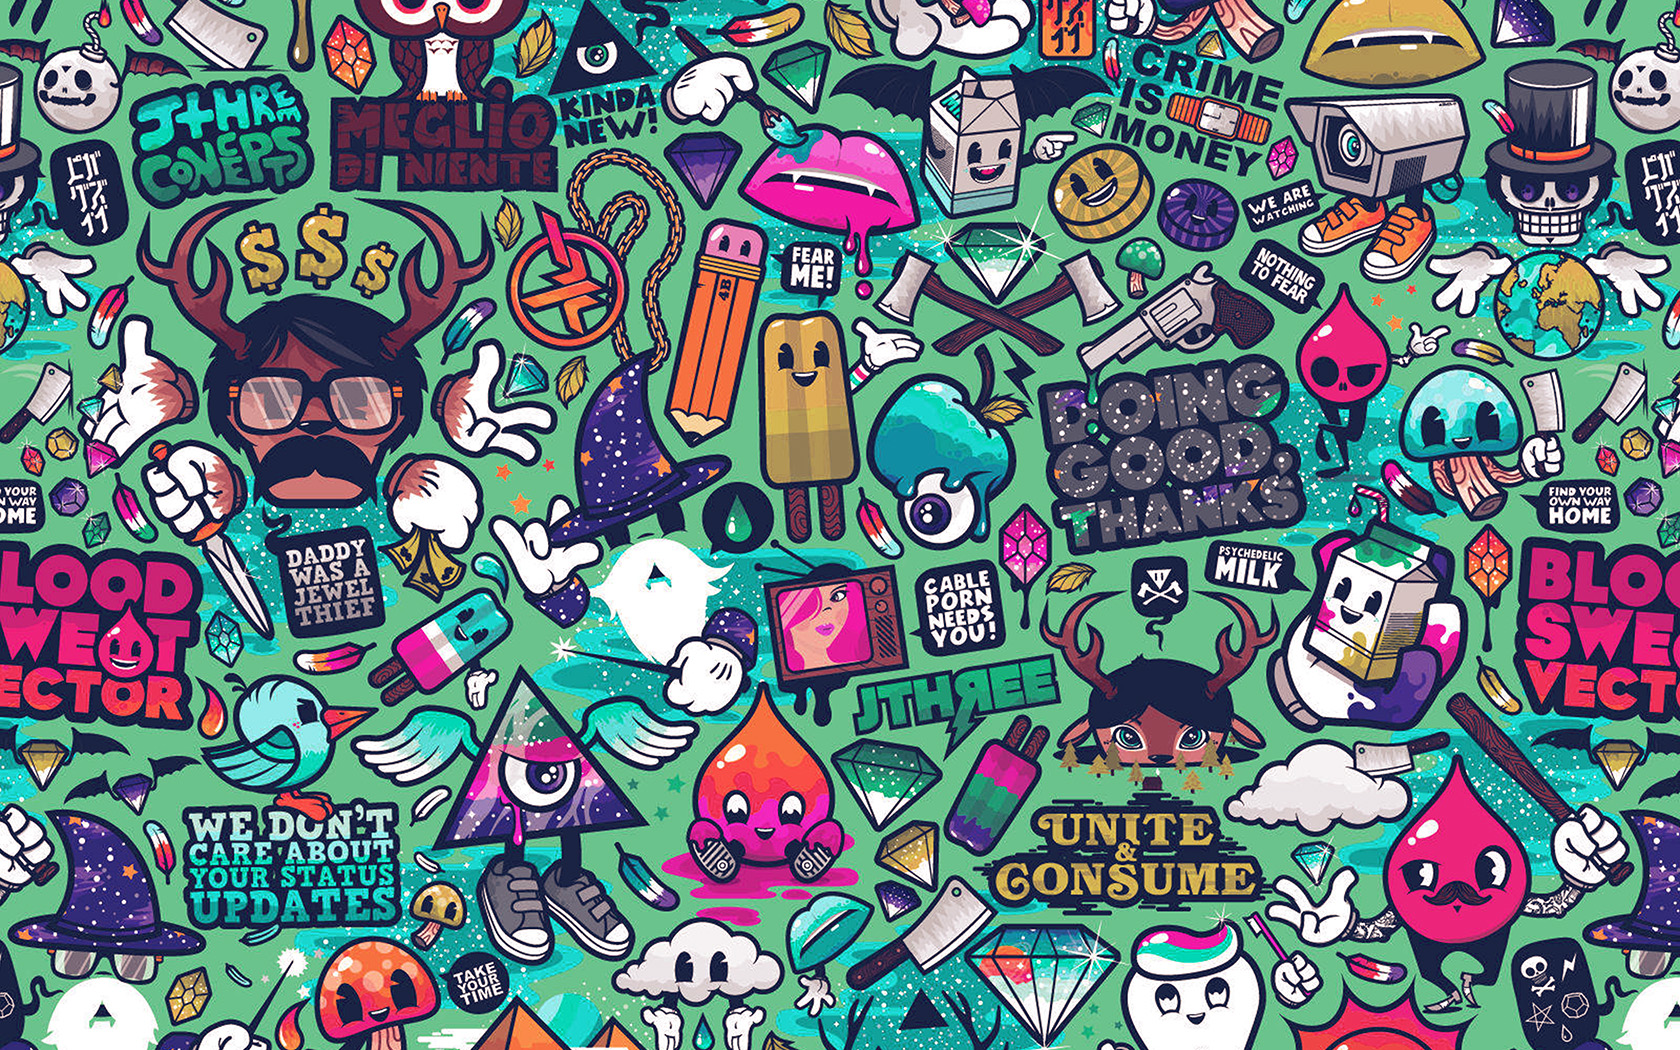 Computer Desktop Hd Wallpapers Fall Aq62 Art Work Pattern Illustration Graffiti Green Wallpaper